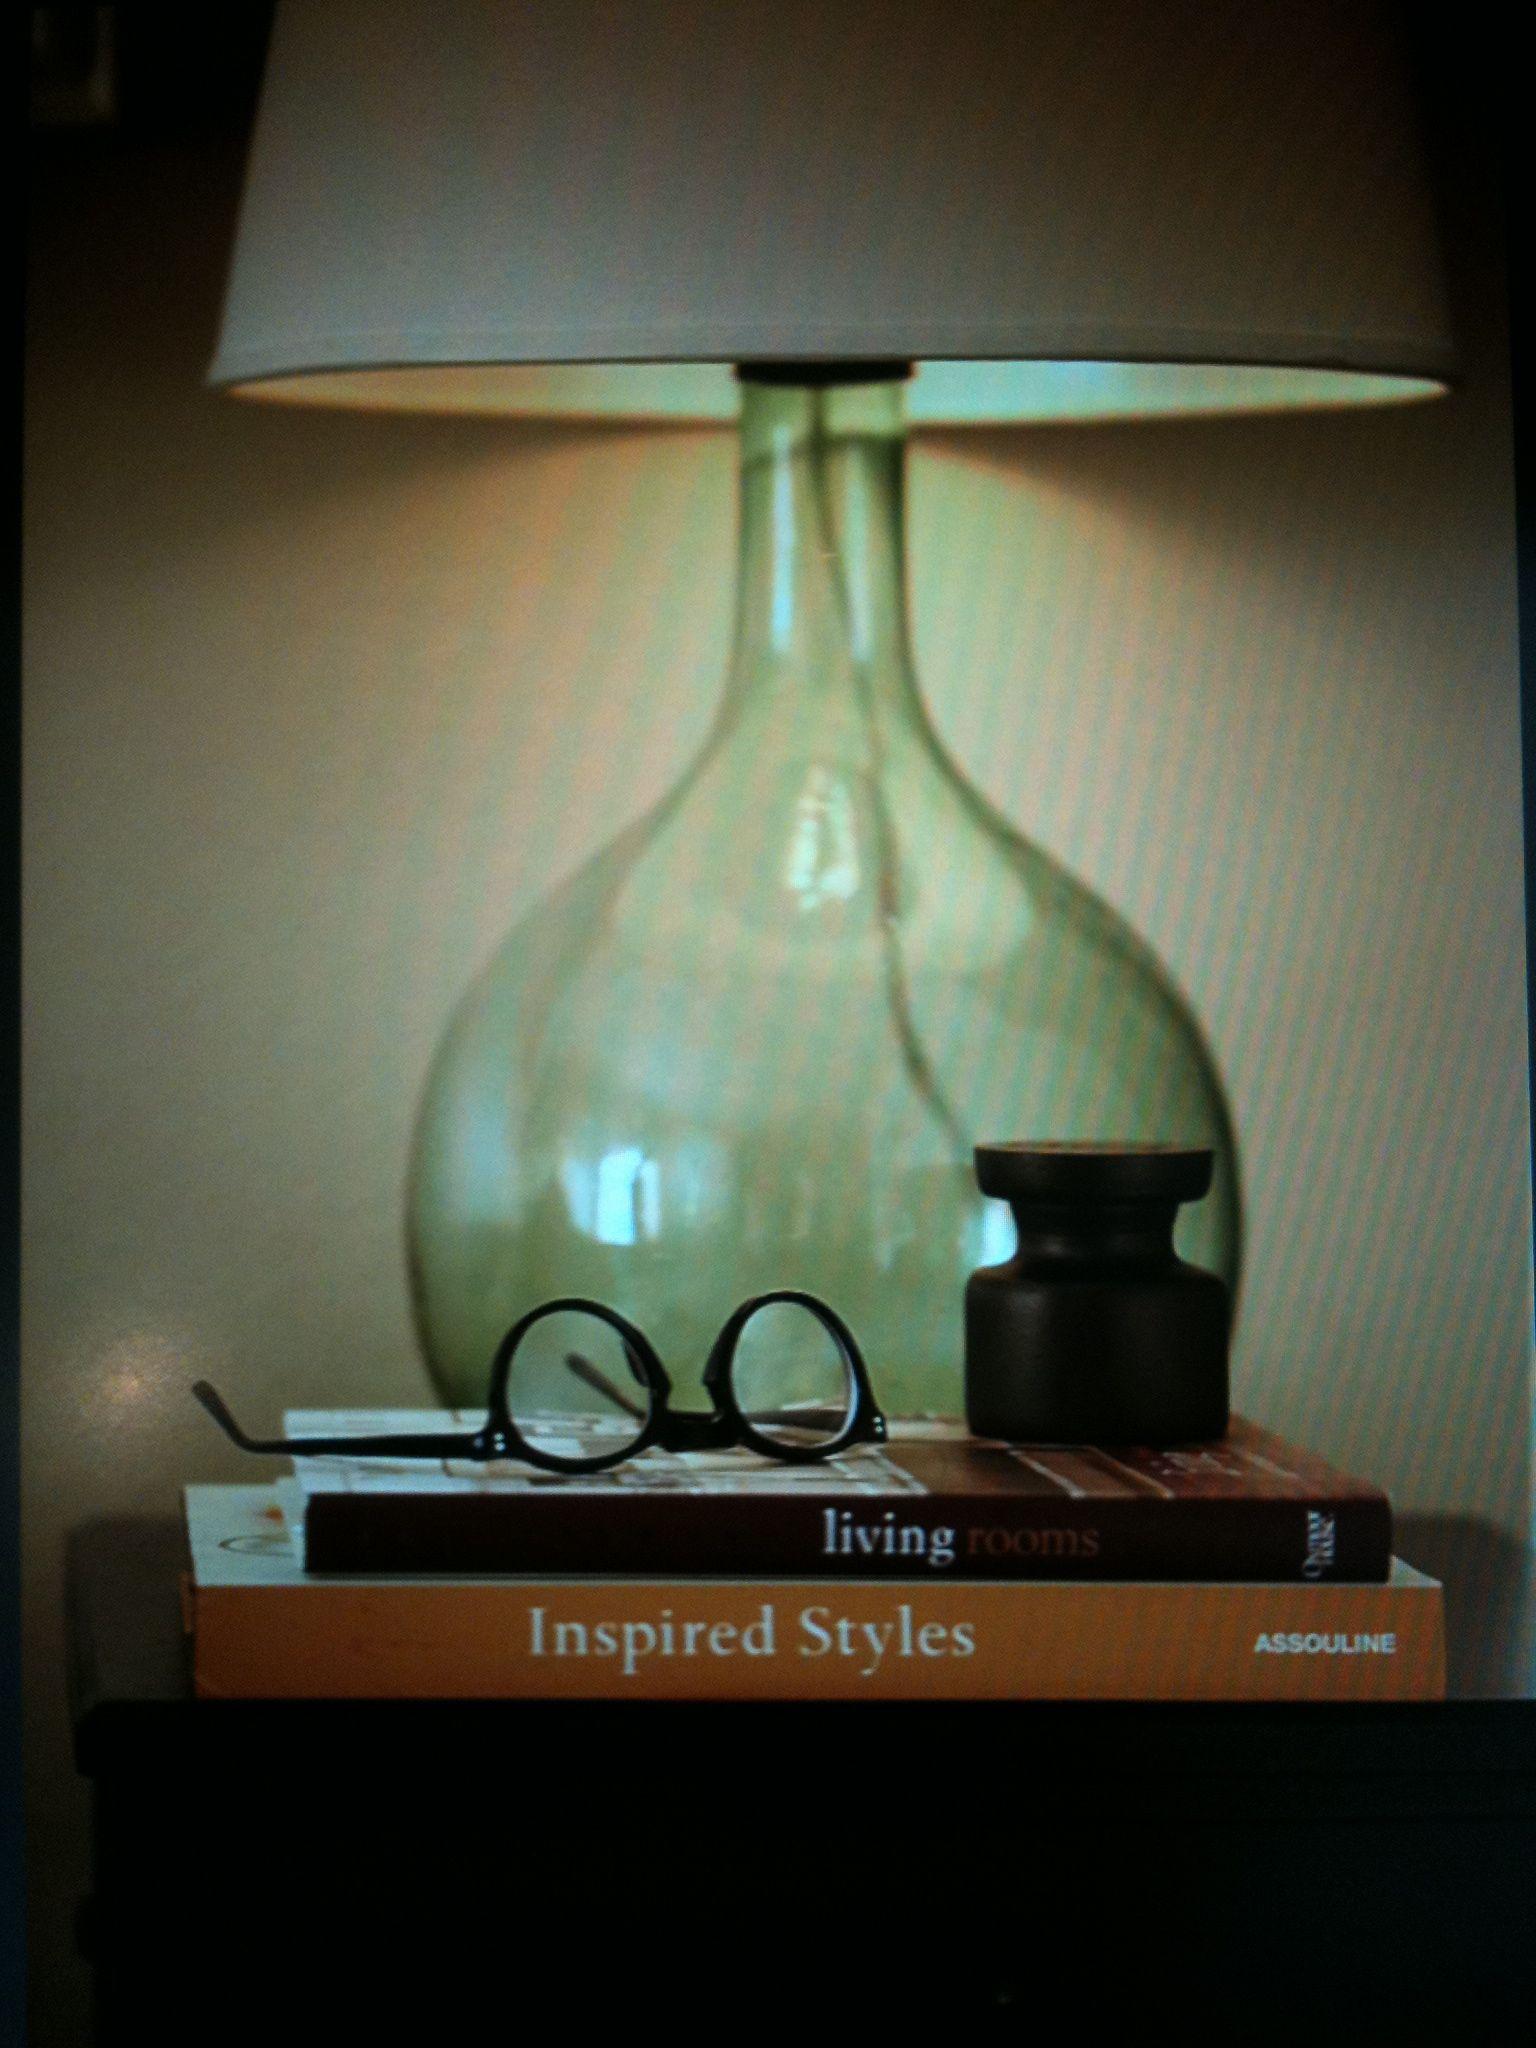 Lamp Shades For Vases | Sevenstonesinc.com on diy bottle lamp, diy moon lamp, diy flower lamp, diy jewelry lamp, diy jug lamp, diy christmas lamp, diy toy lamp, diy figurine lamp, diy ribbon lamp, diy butterfly lamp, diy doll lamp, diy pendant lamp, diy book lamp, diy plant lamp, diy tree lamp, diy bed lamp, diy art deco lamp, diy chandelier lamp, diy vintage lamp, diy box lamp,